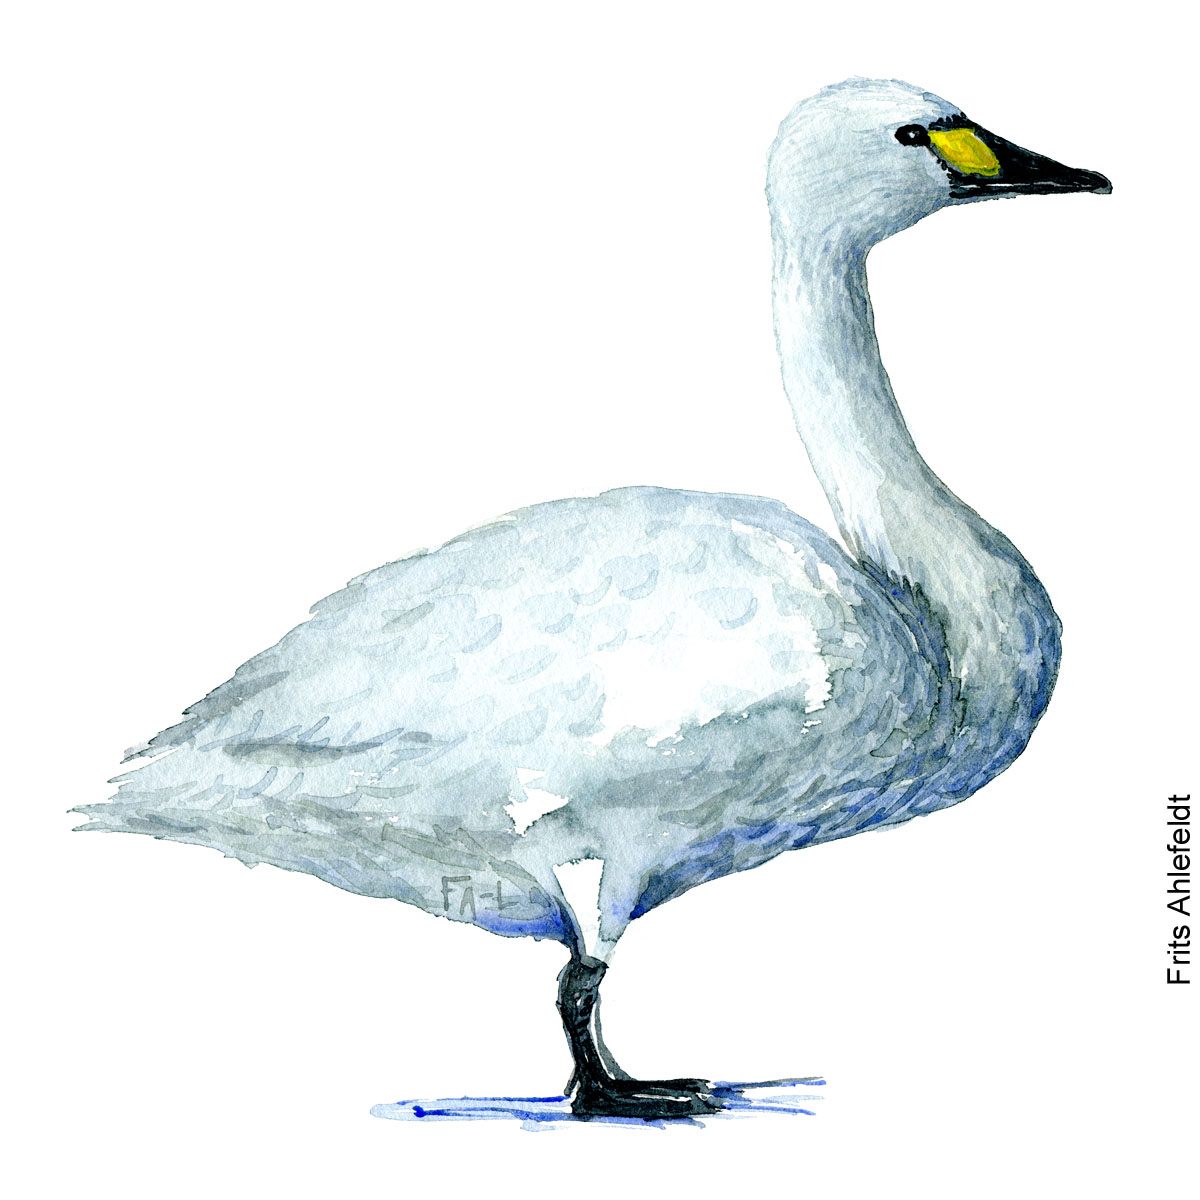 Watercolor of Tundra swan - Bewick's swan / Whistling swan (Pibesvane, TundraSchwan, Cygnus columbianus ) Biodiversity illustration by Frits Ahlefeldt